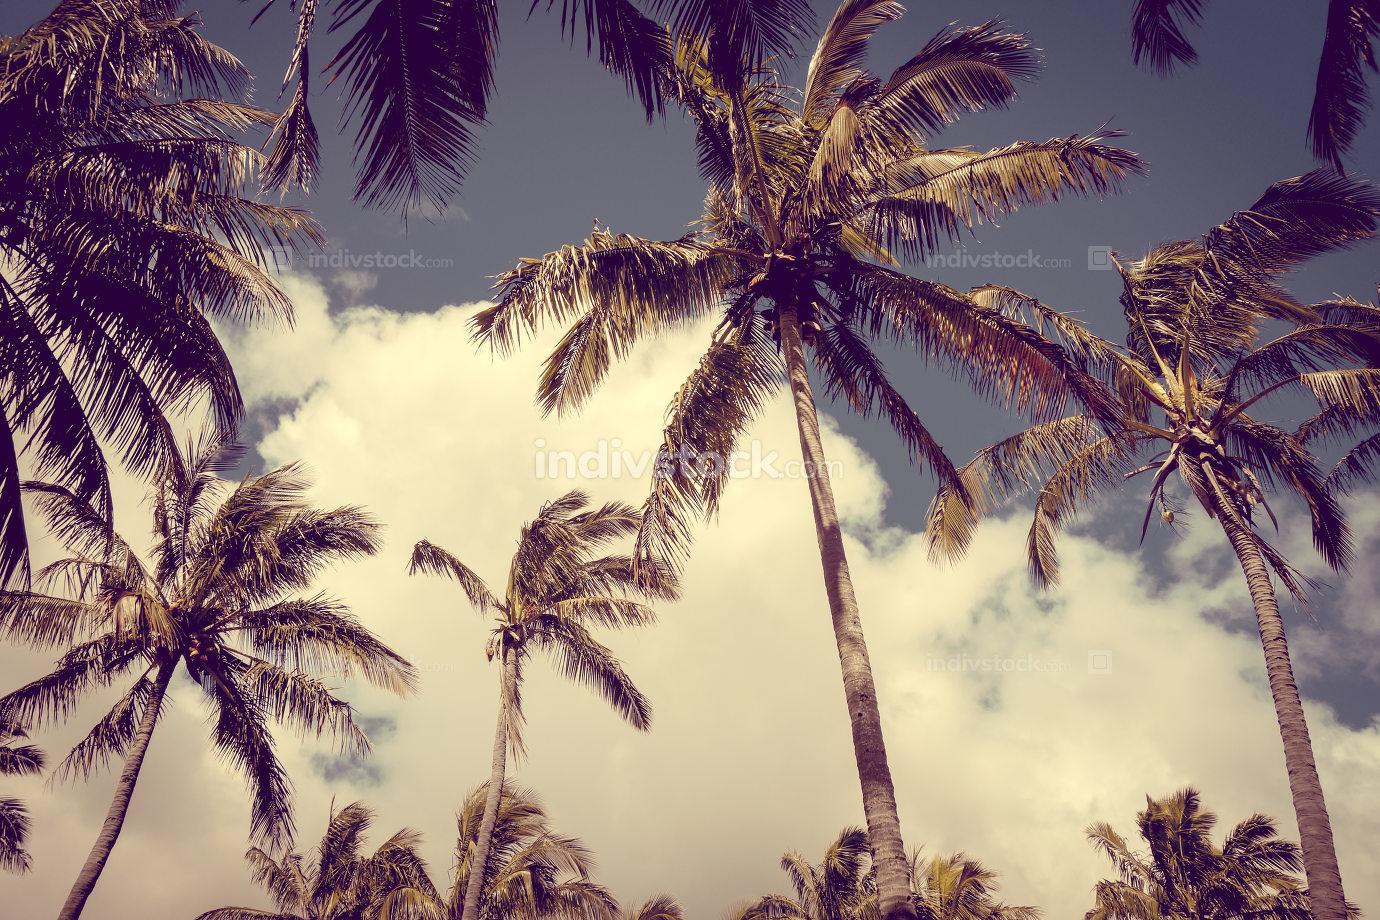 Palm trees on Anakena beach, easter island